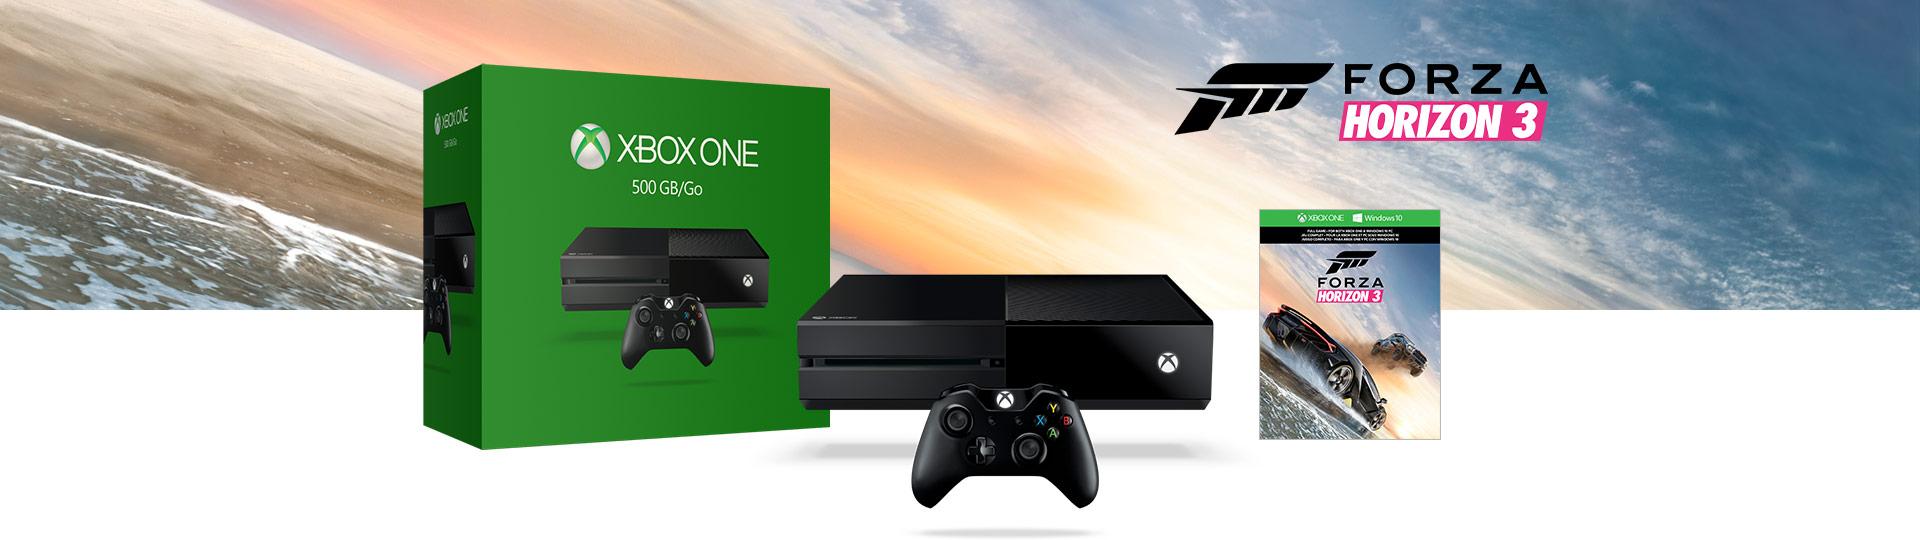 Forza Horizon 3 500GB Bundle